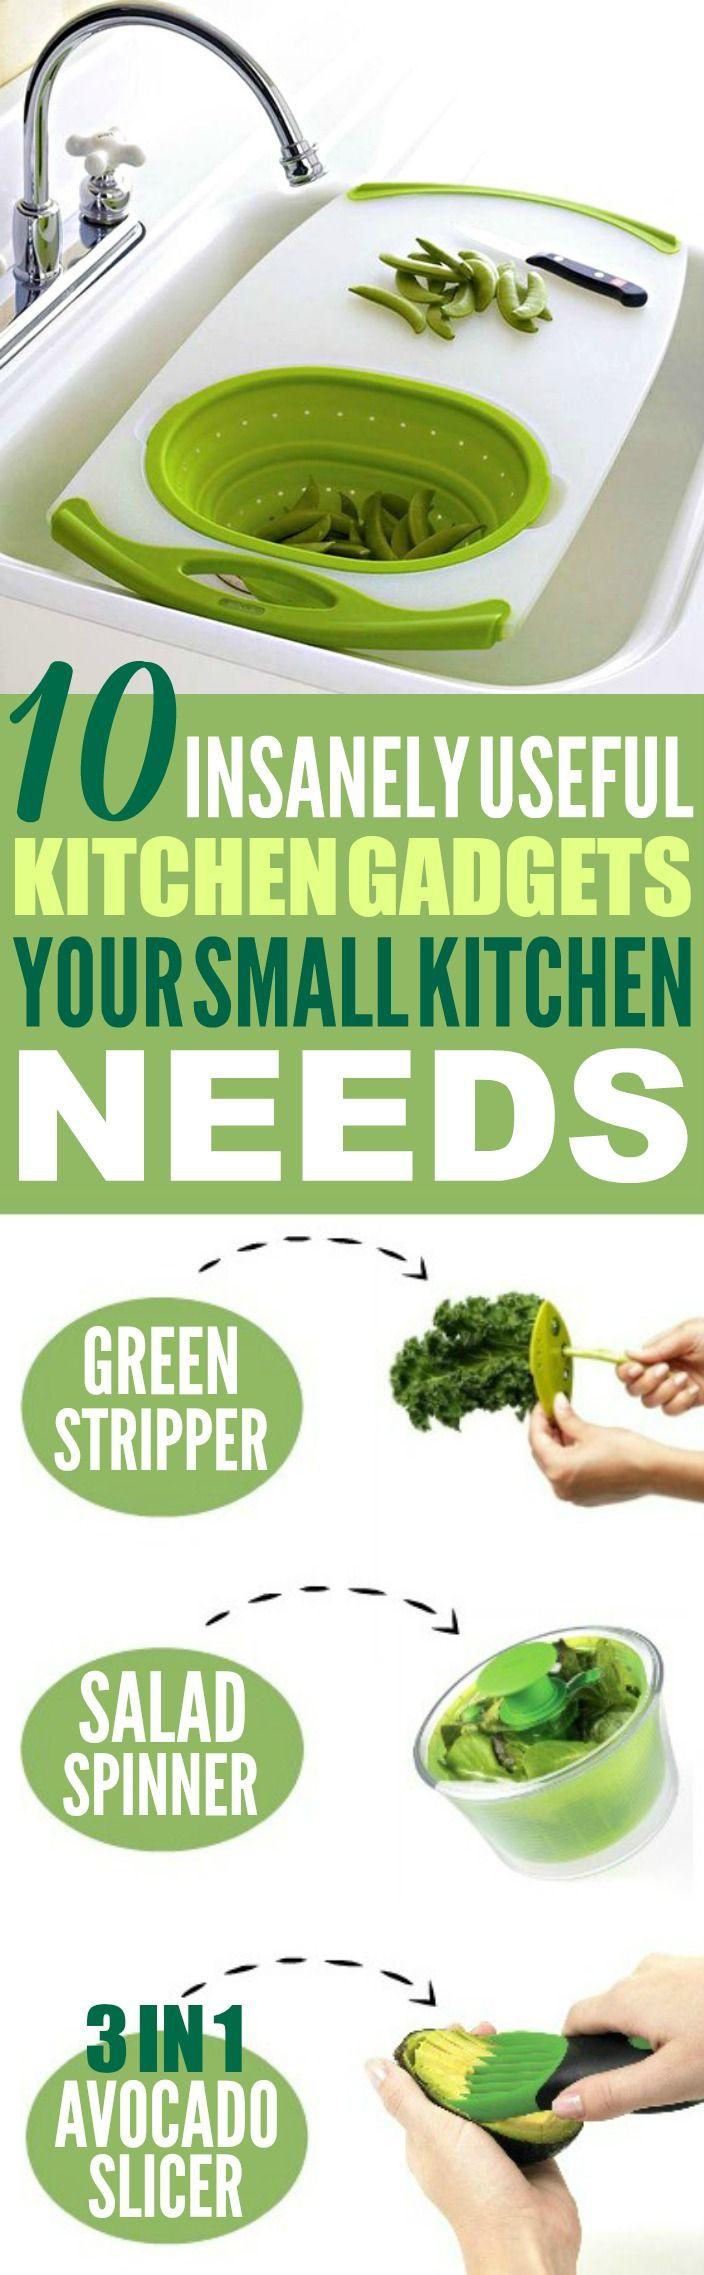 10 Time-Saving Kitchen Gadgets You'll Wish You Had Sooner